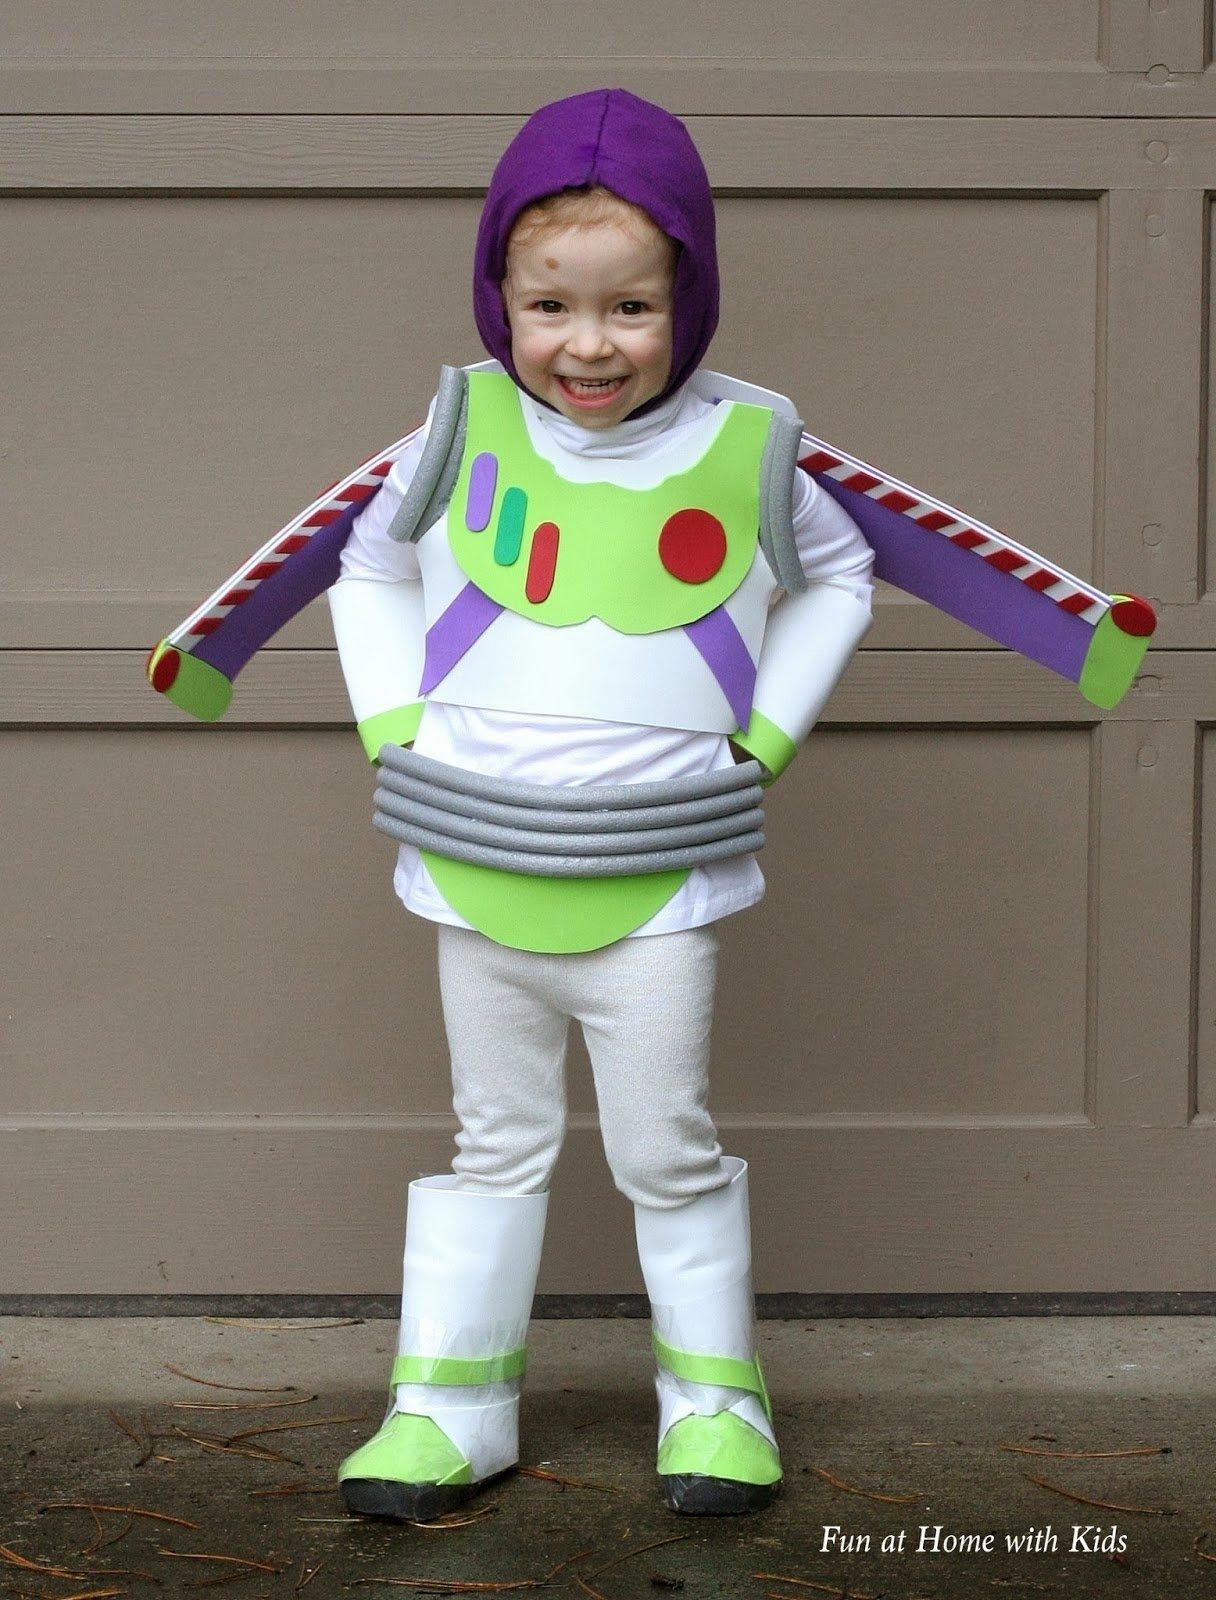 10 Attractive Home Made Halloween Costume Ideas diy kids buzz lightyear no sew halloween costume buzz  sc 1 st  Unique Ideas 2018 & 10 Attractive Home Made Halloween Costume Ideas